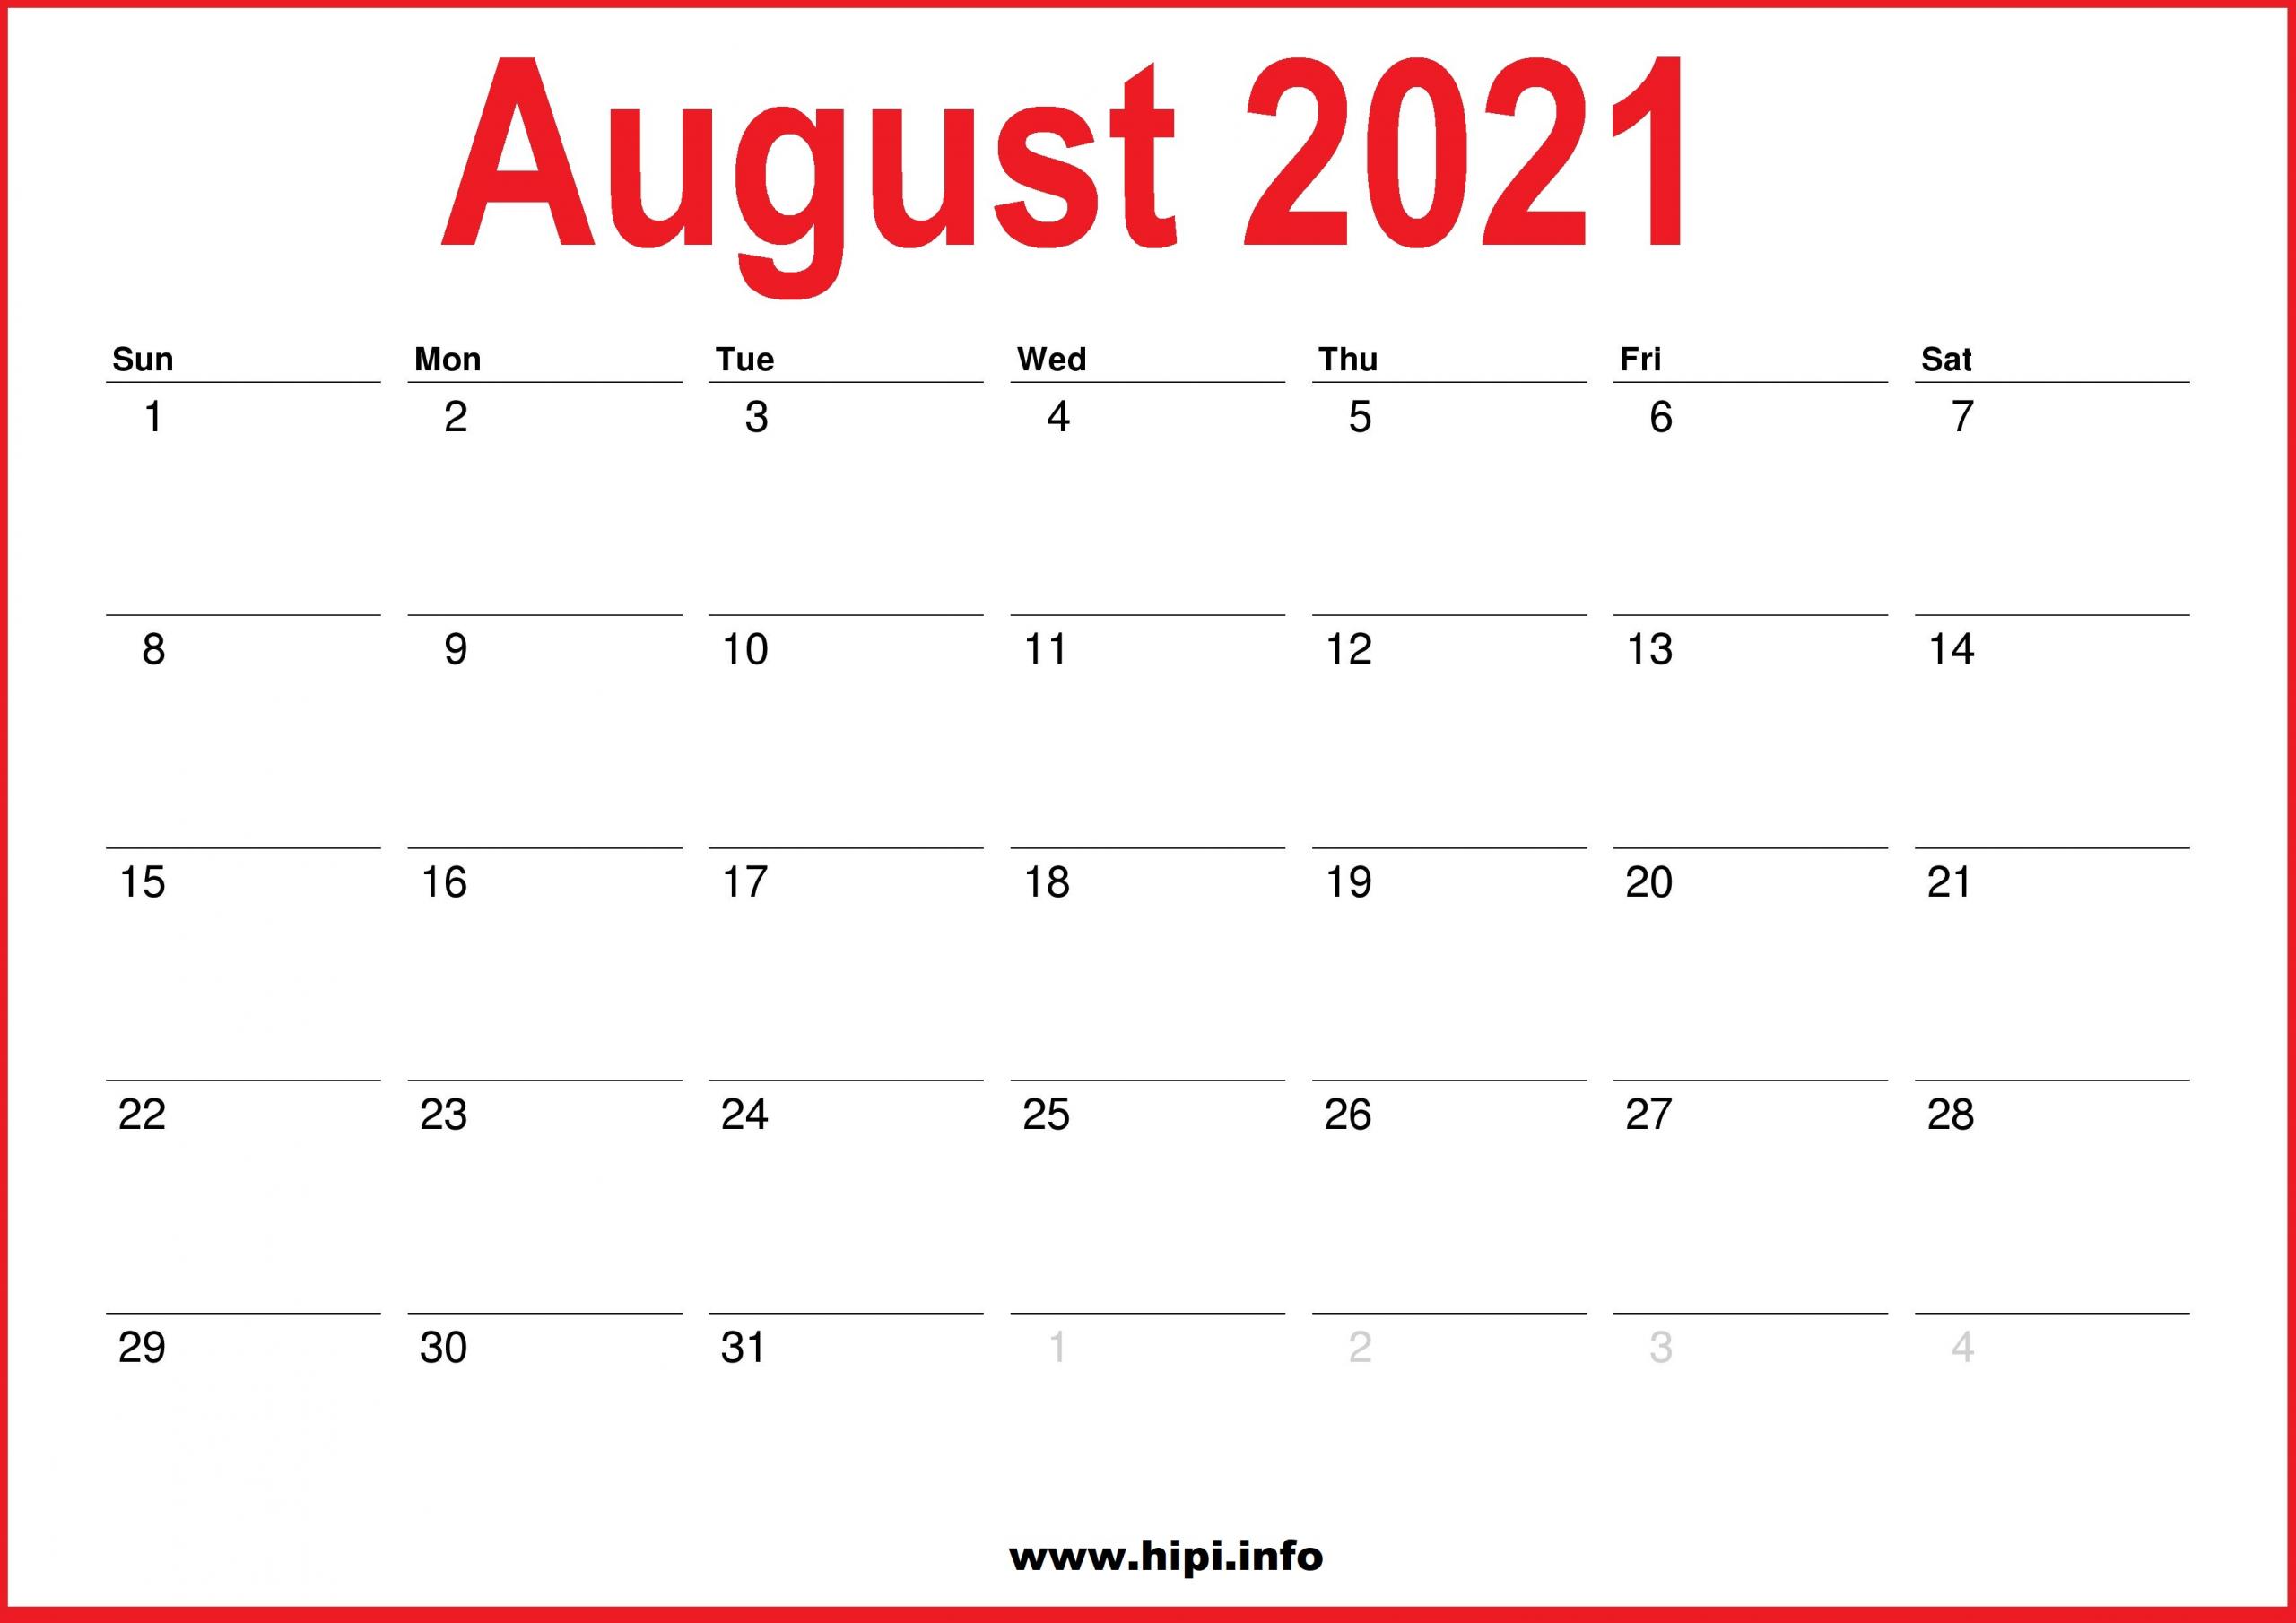 2021 Monthly Calendars 2021 July August September